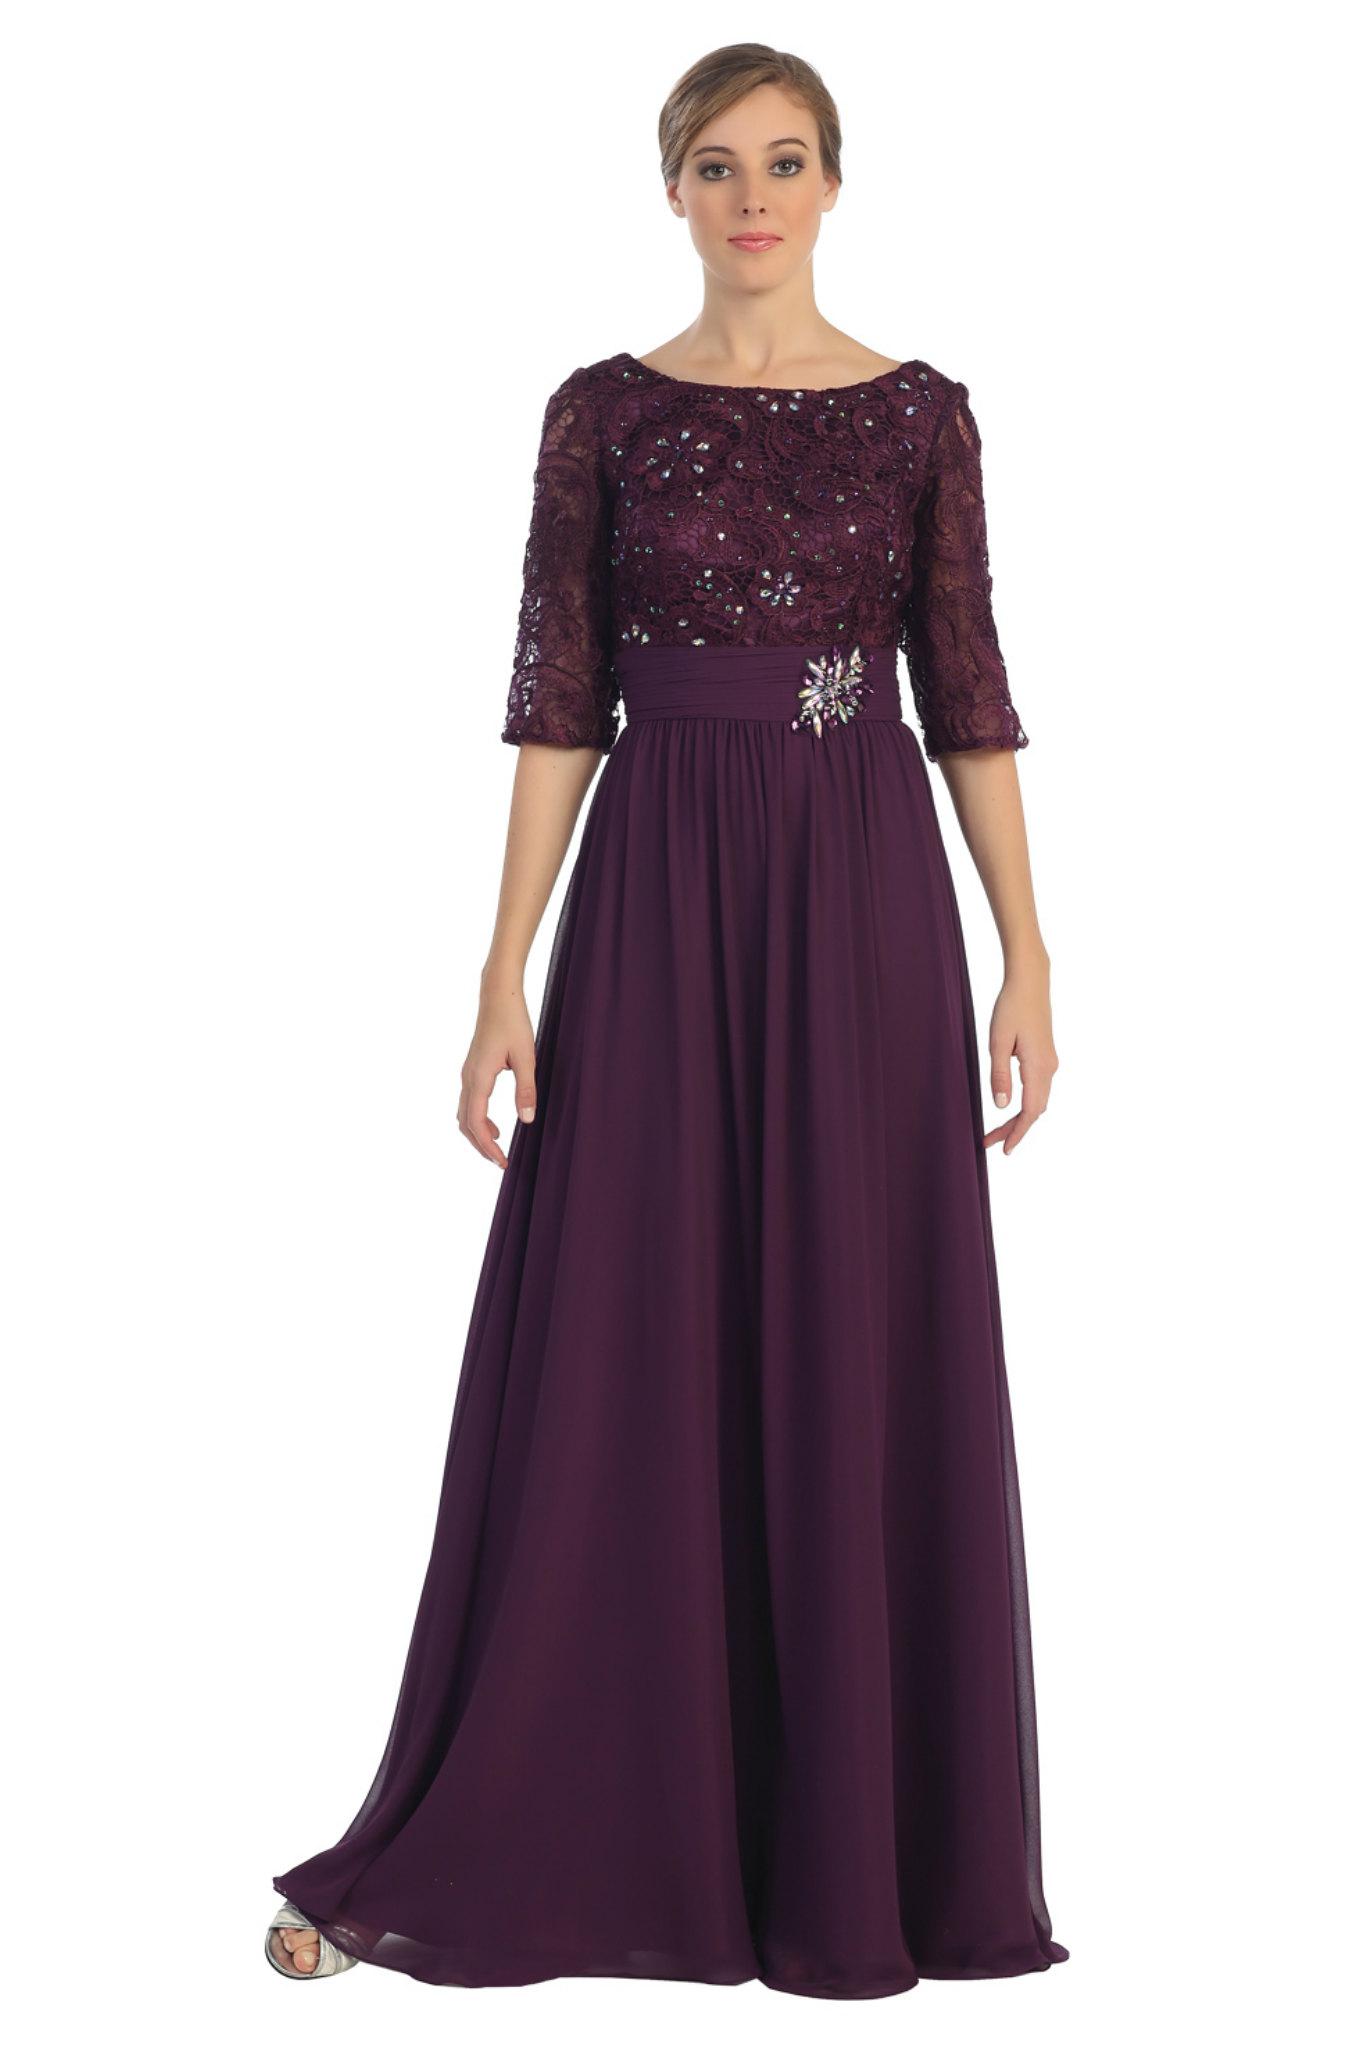 Elegant Formal Lace Mother of the Bride Groom Modest